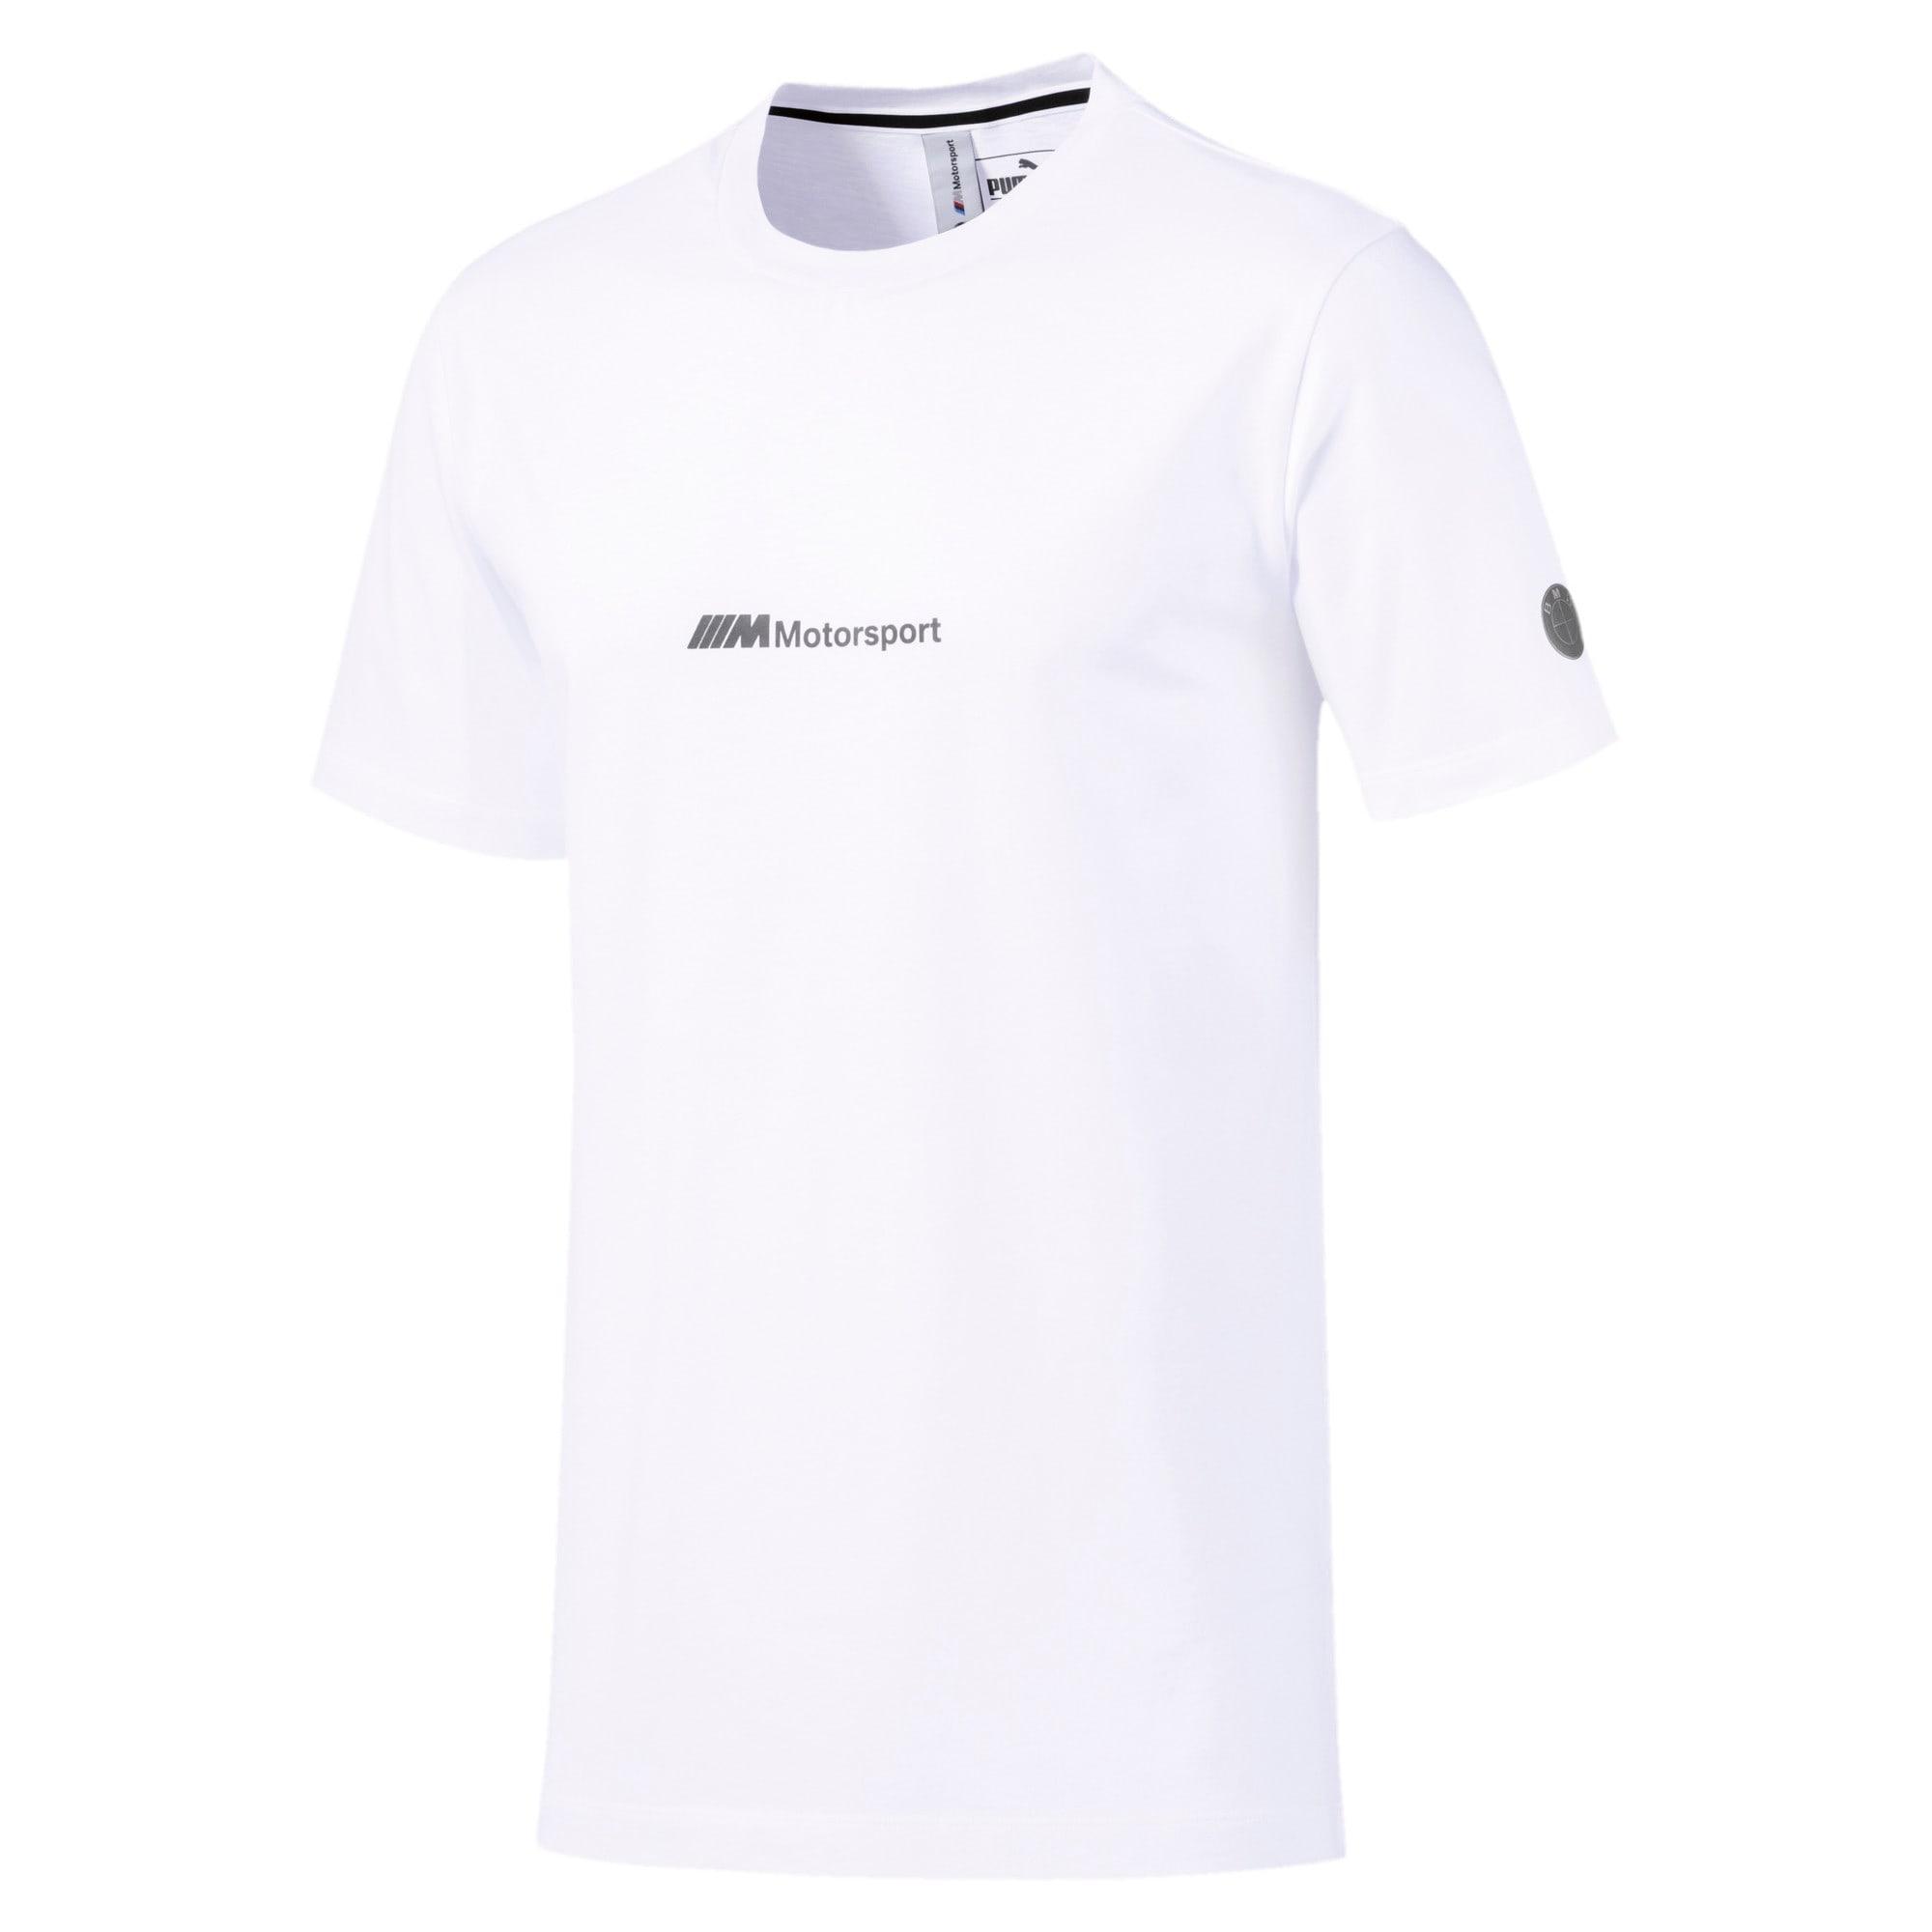 Thumbnail 1 of BMW MMS ライフ Tシャツ, Puma White, medium-JPN